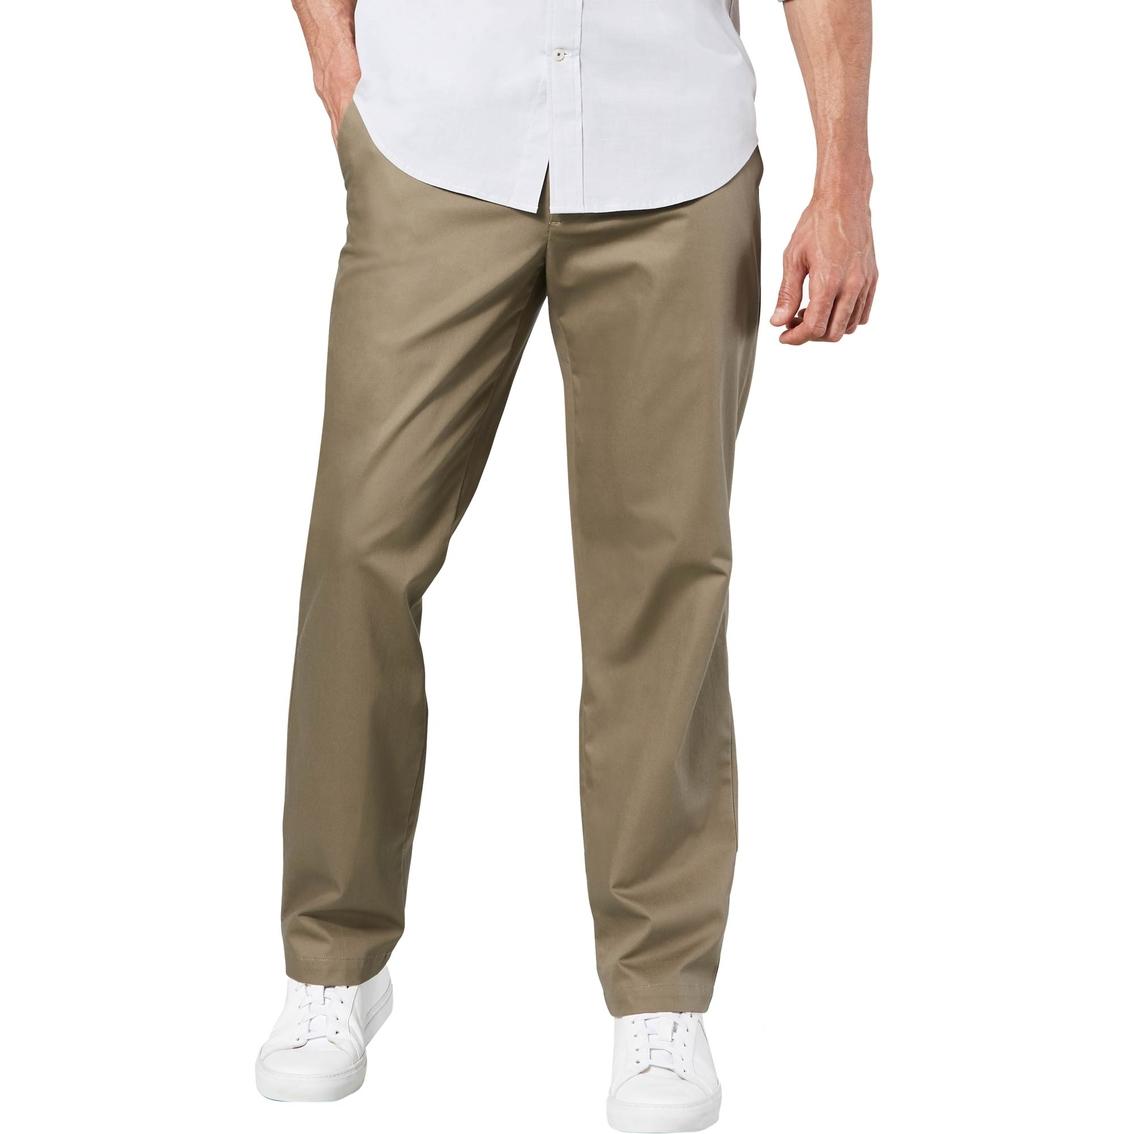 6581cc7f9e0982 Dockers Straight Fit Signature Khaki Lux Cotton Stretch Pants ...